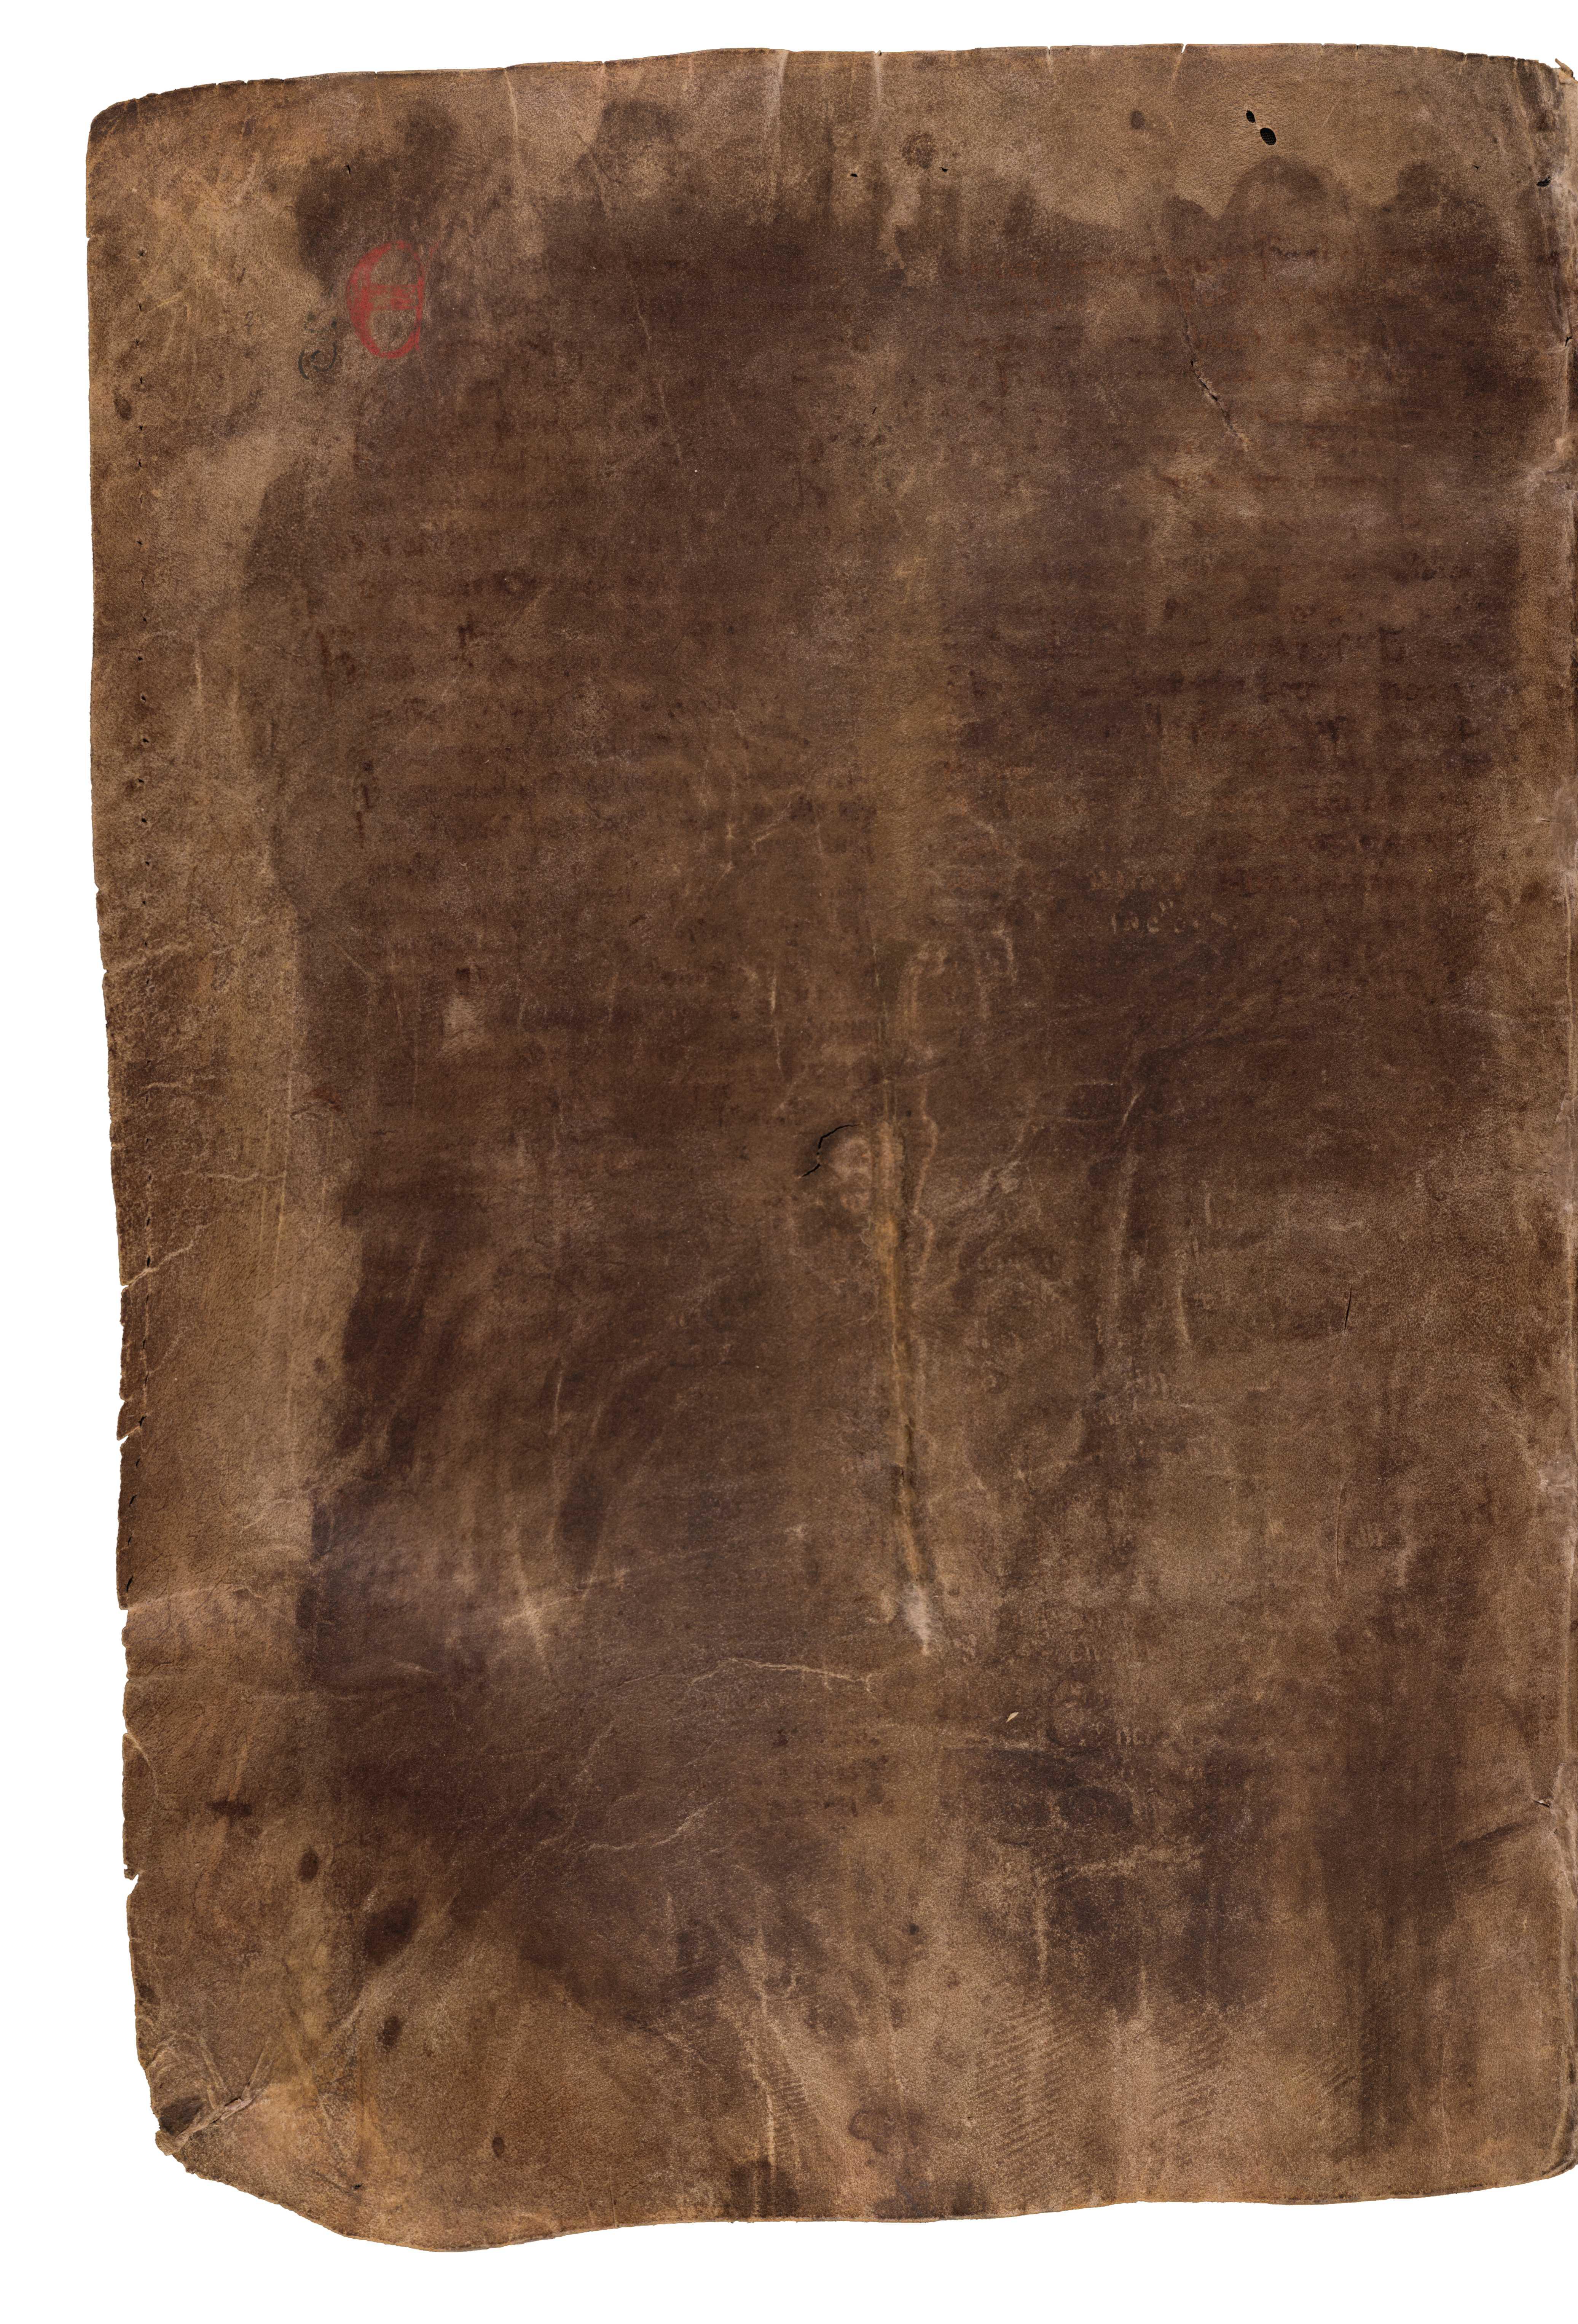 AM 132 fol - 99v